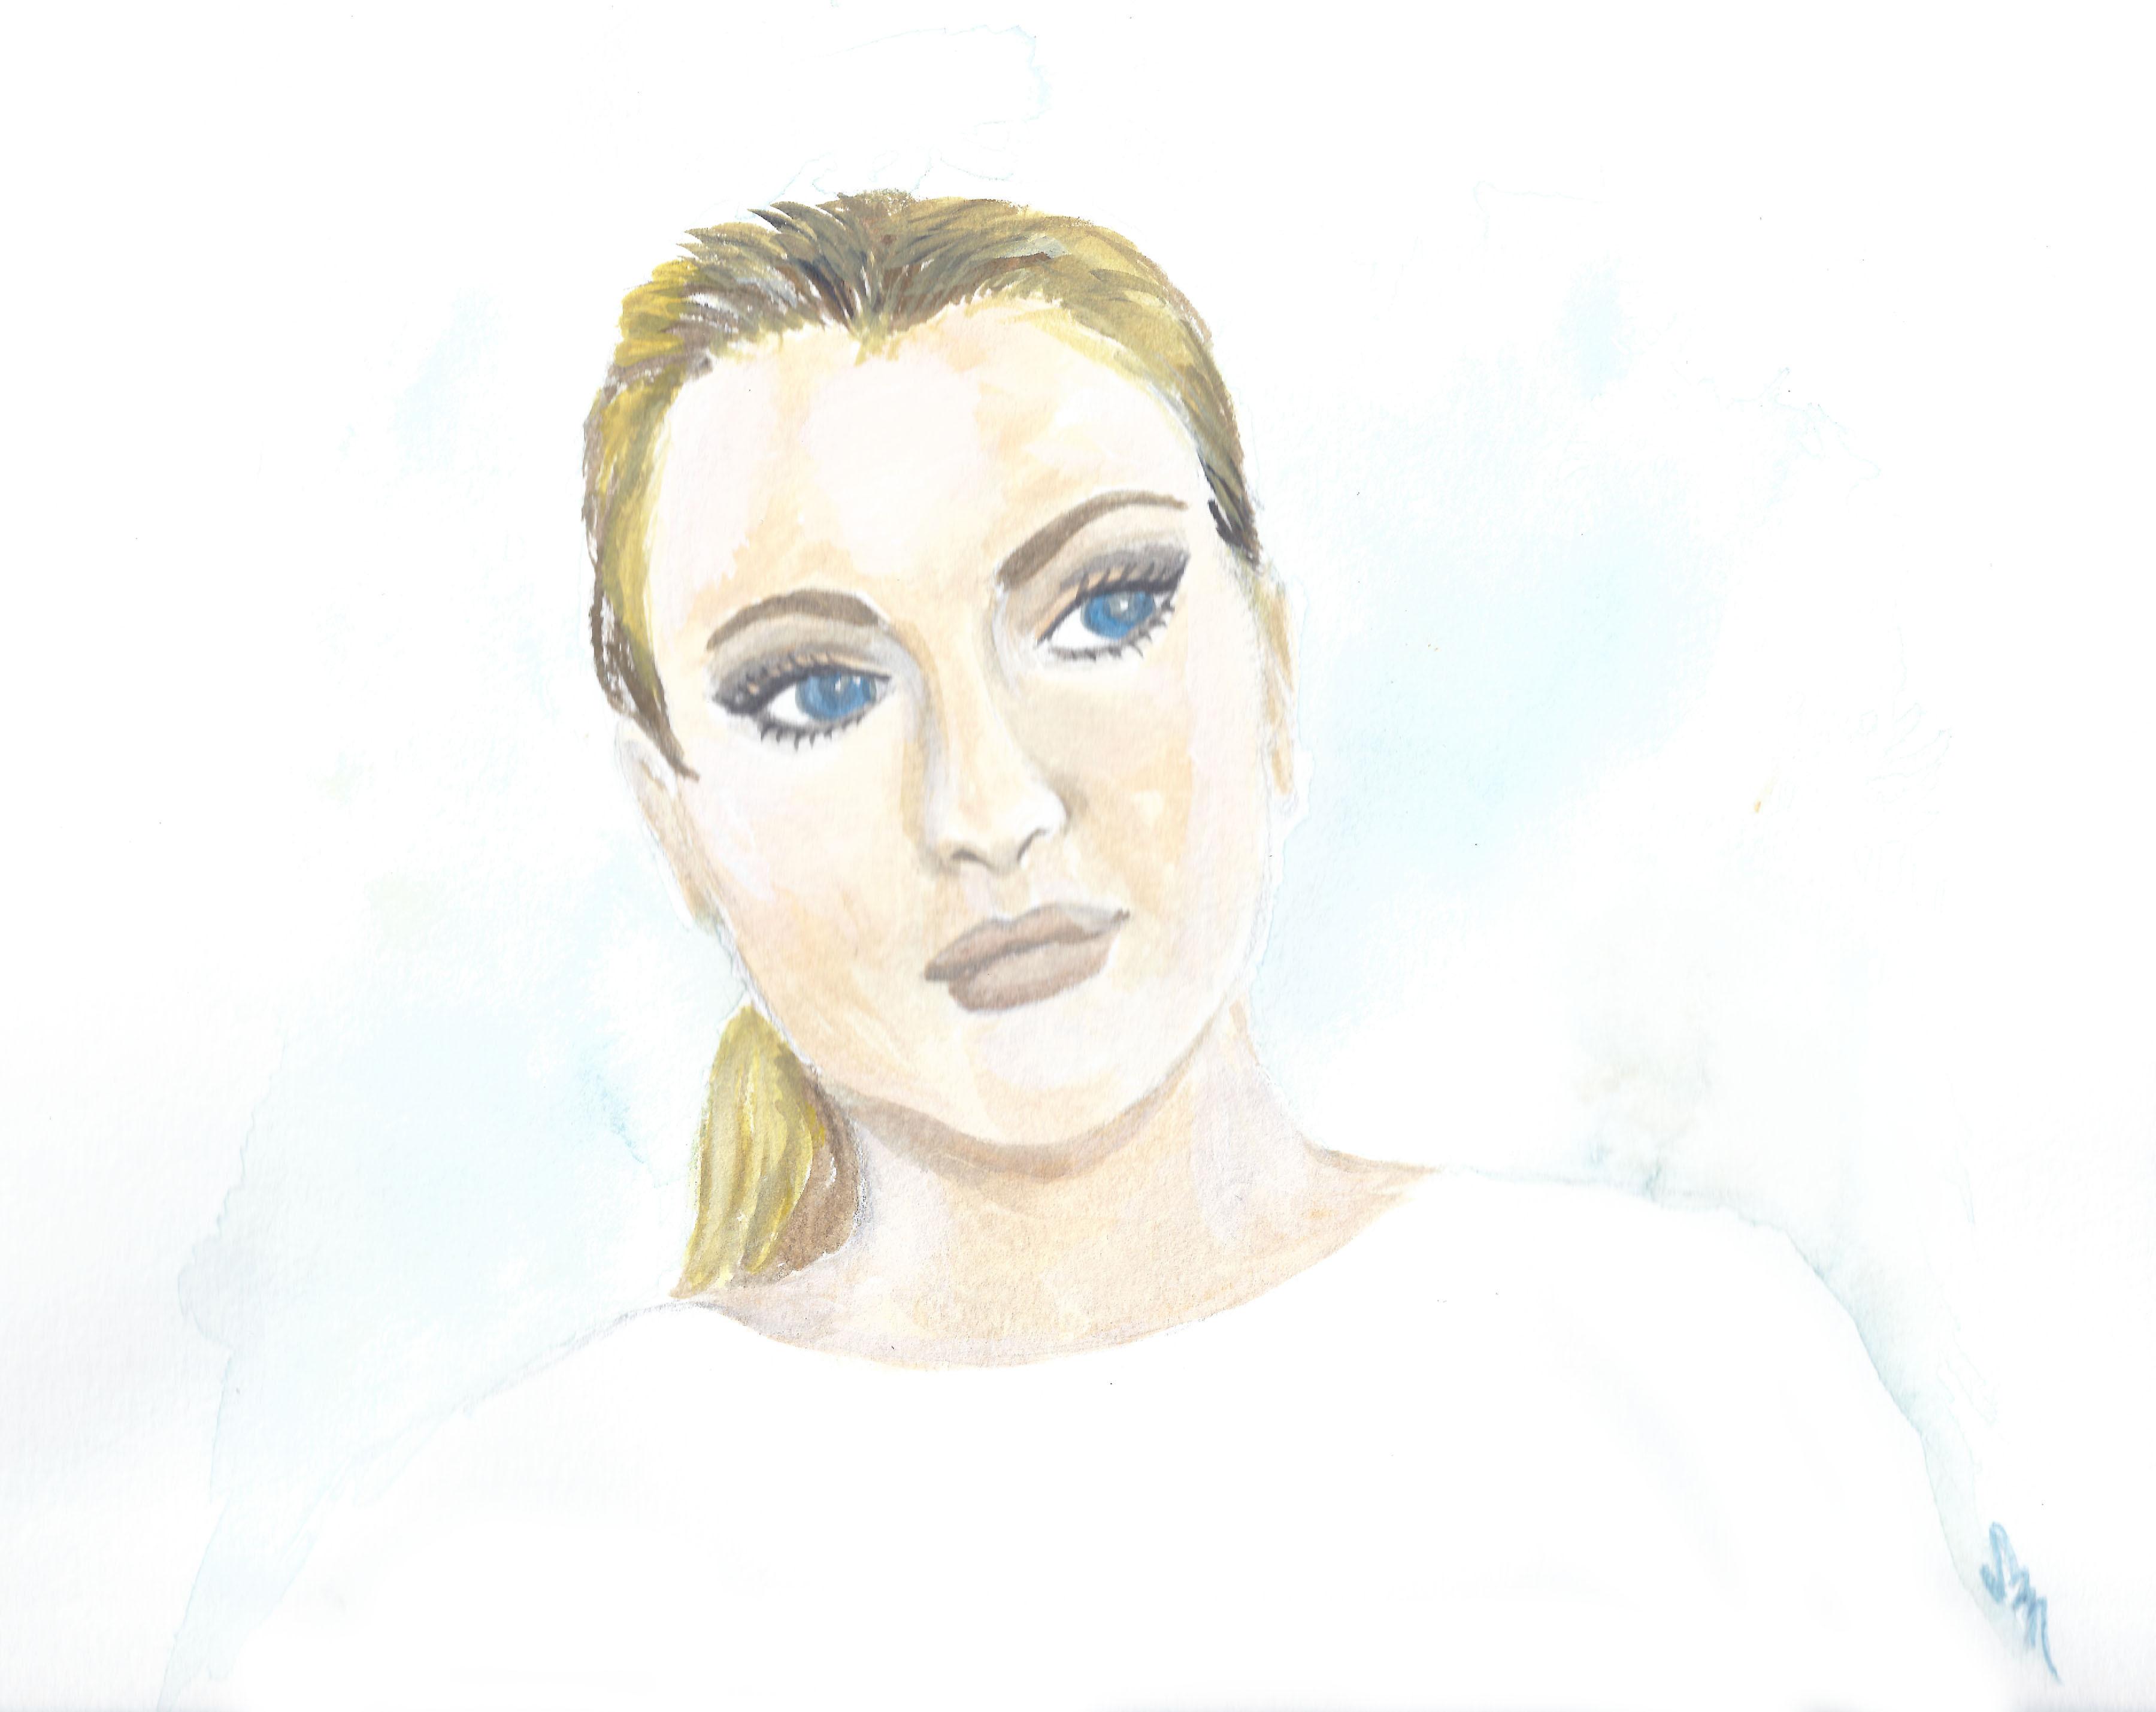 Lindsay Lohan starts a style blog